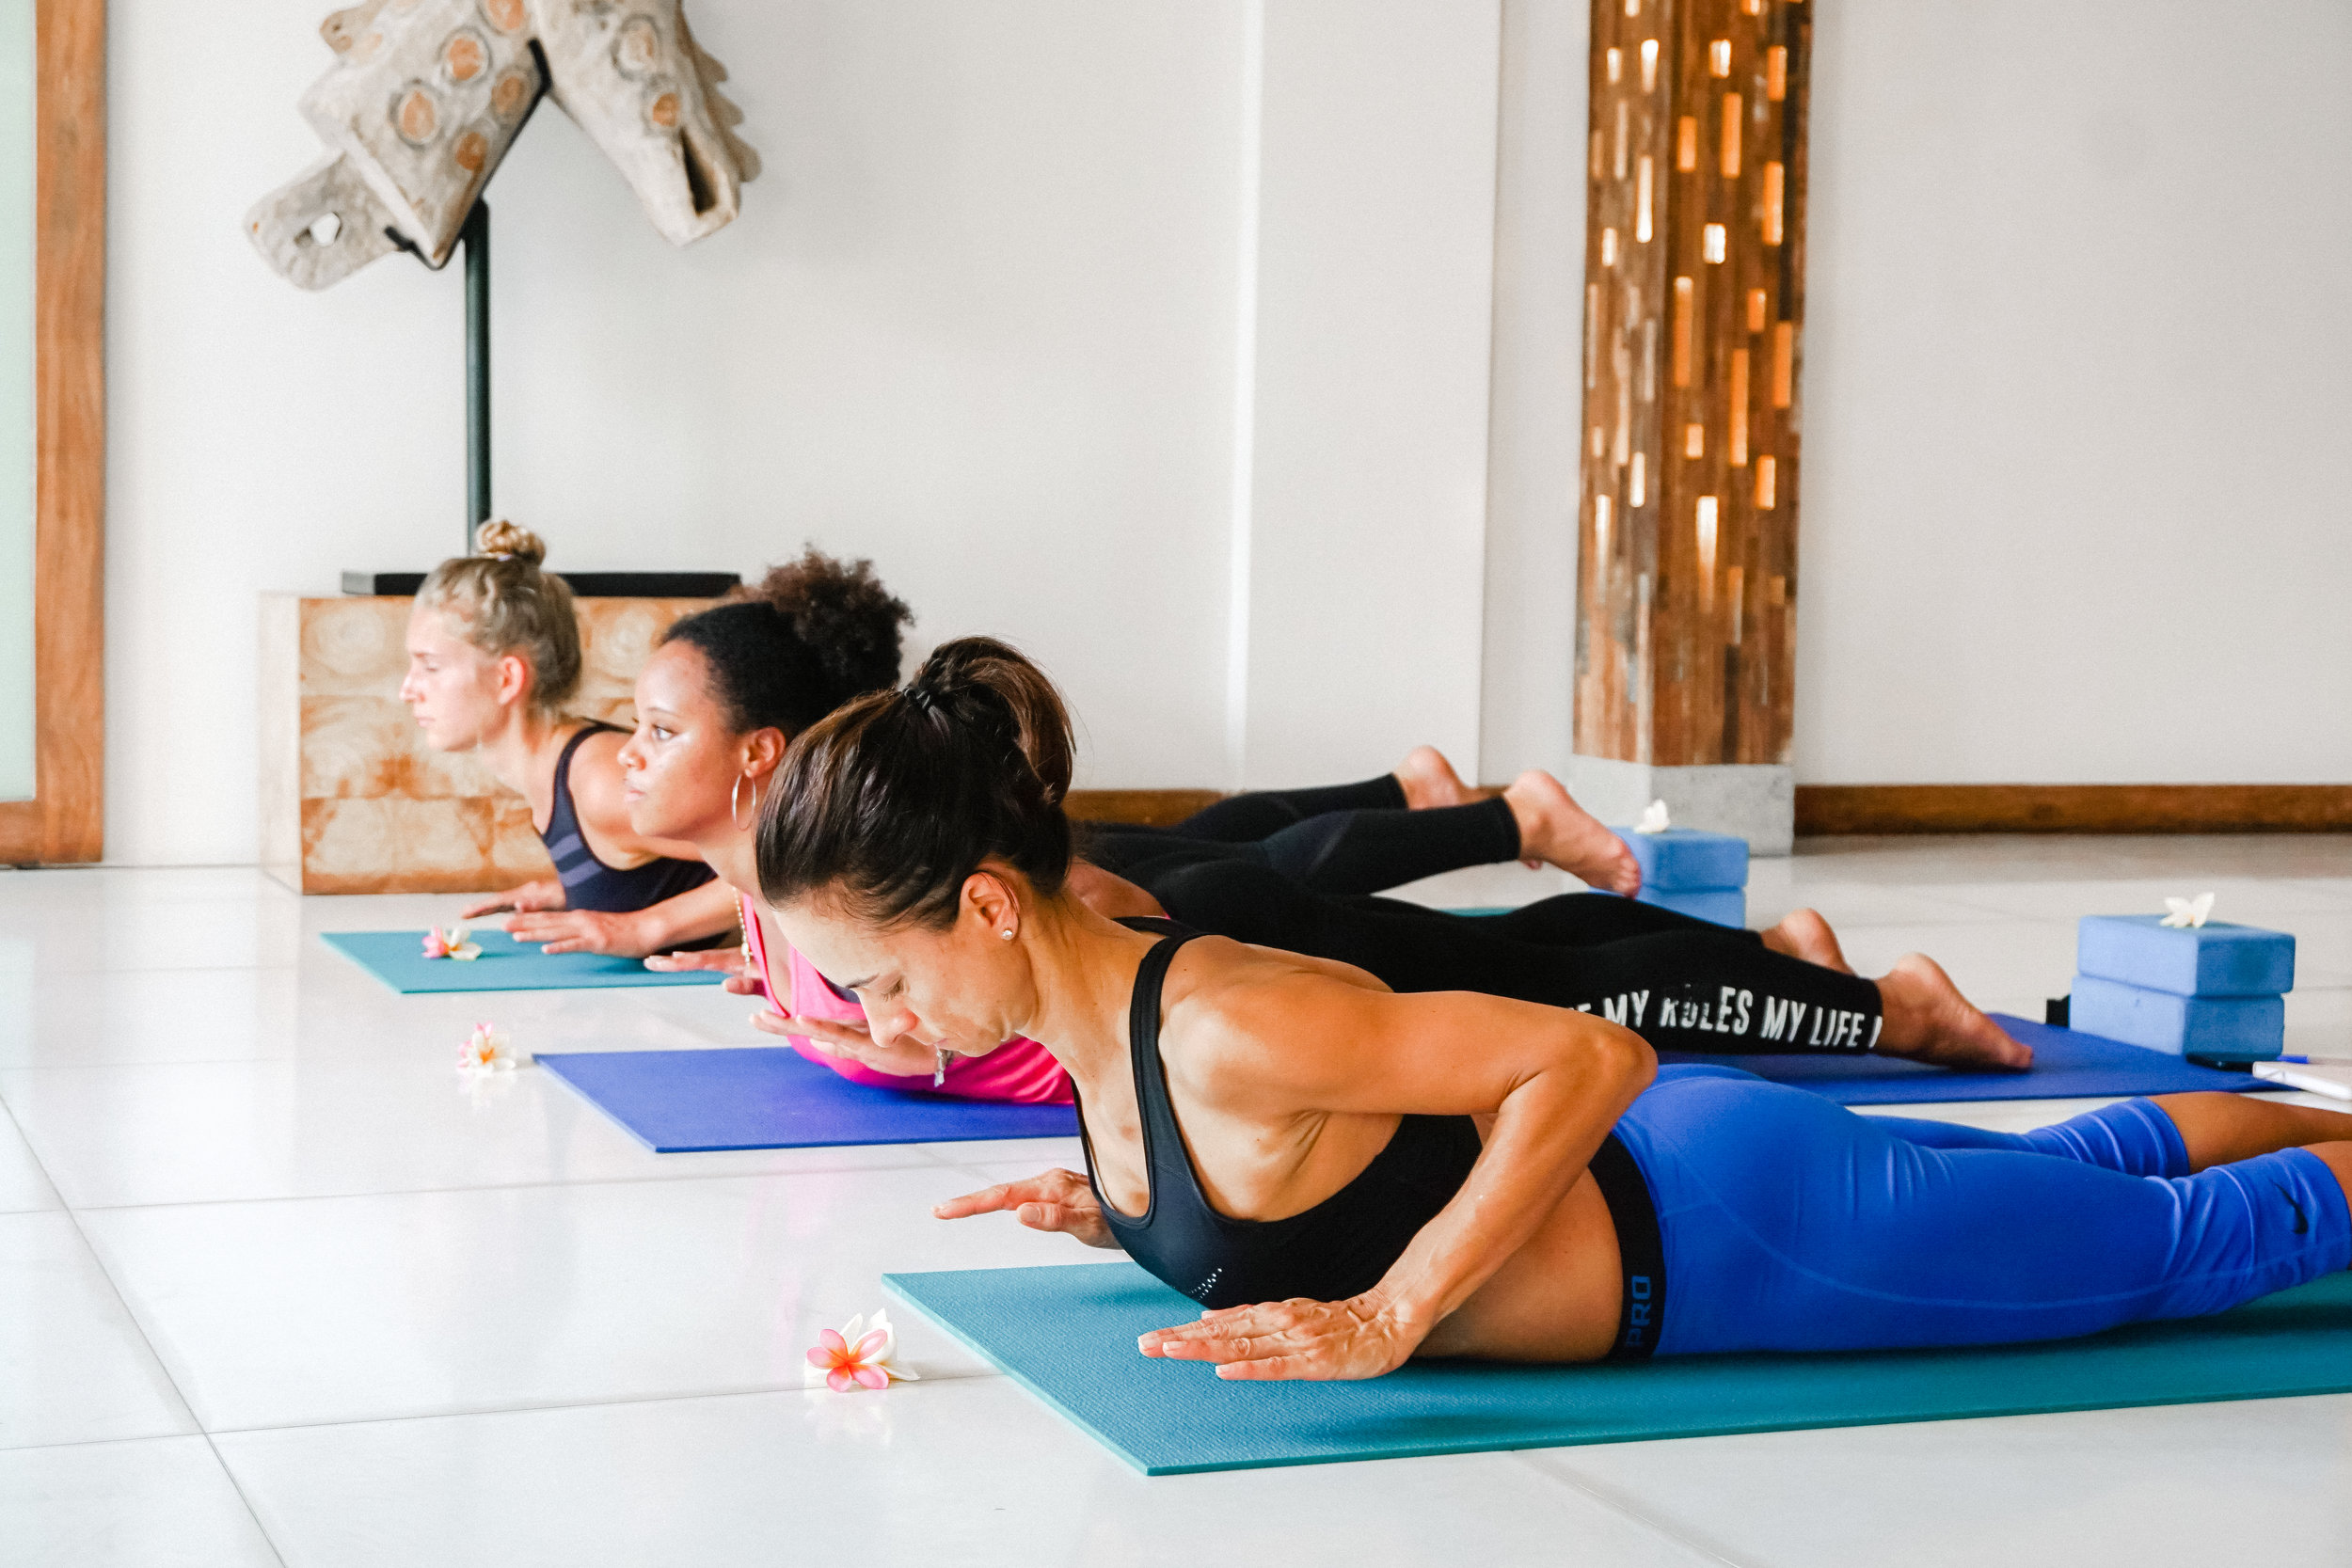 Sattva-Soul-Yoga-Retreat-Bali-2018-02243.jpg